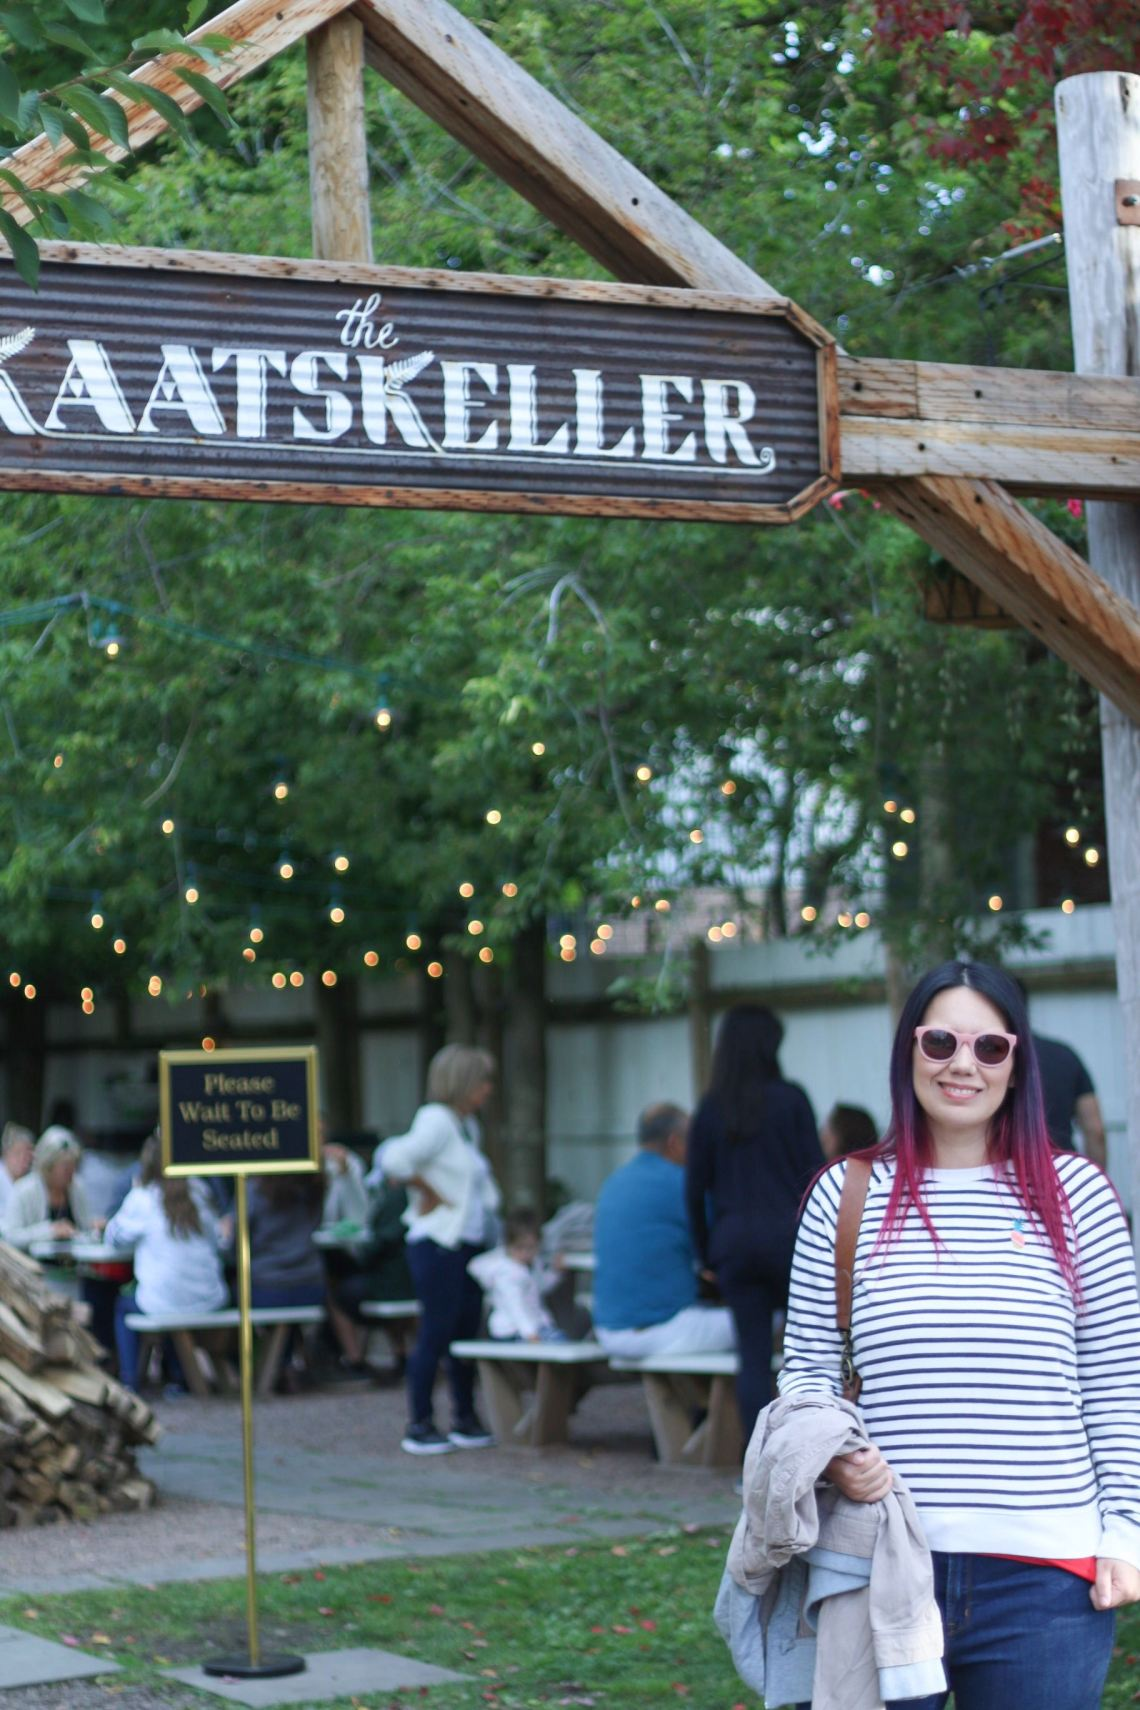 The Kaatskeller wood-fire oven pizza restaurant in Livingston Manor - Catskill, New York